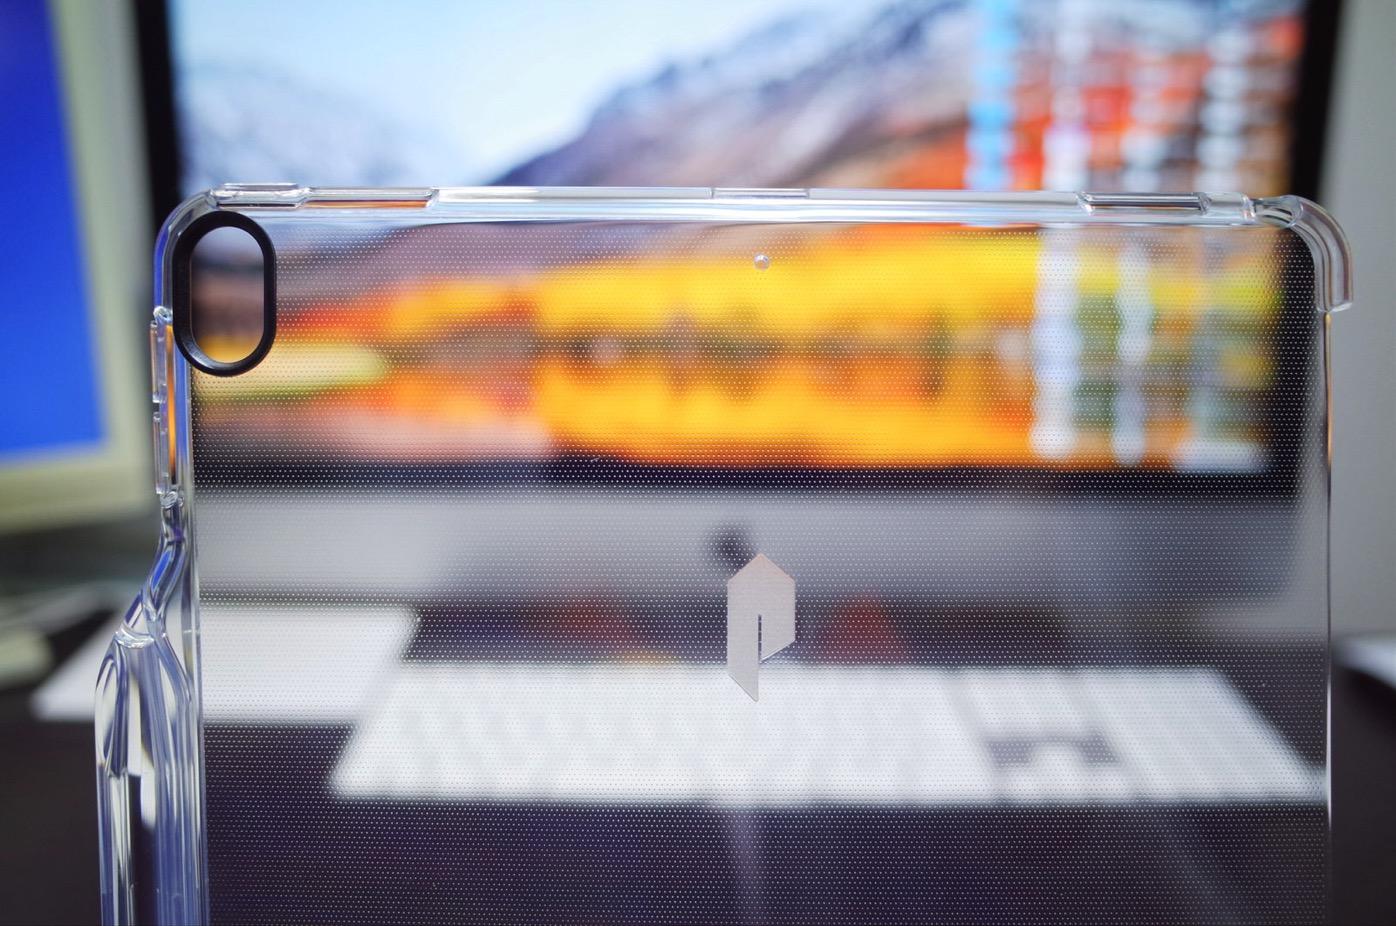 iPad Pro 10.5 ケース Poetic -[Lumos Series]- アップル 10.5型 アイパッド プロ 対応 [ウルトラスリム] [TPU製 ケース] Smart Keyboard 対応 Apple Pencil 収納スロット付き (クリスタルクリア)-4